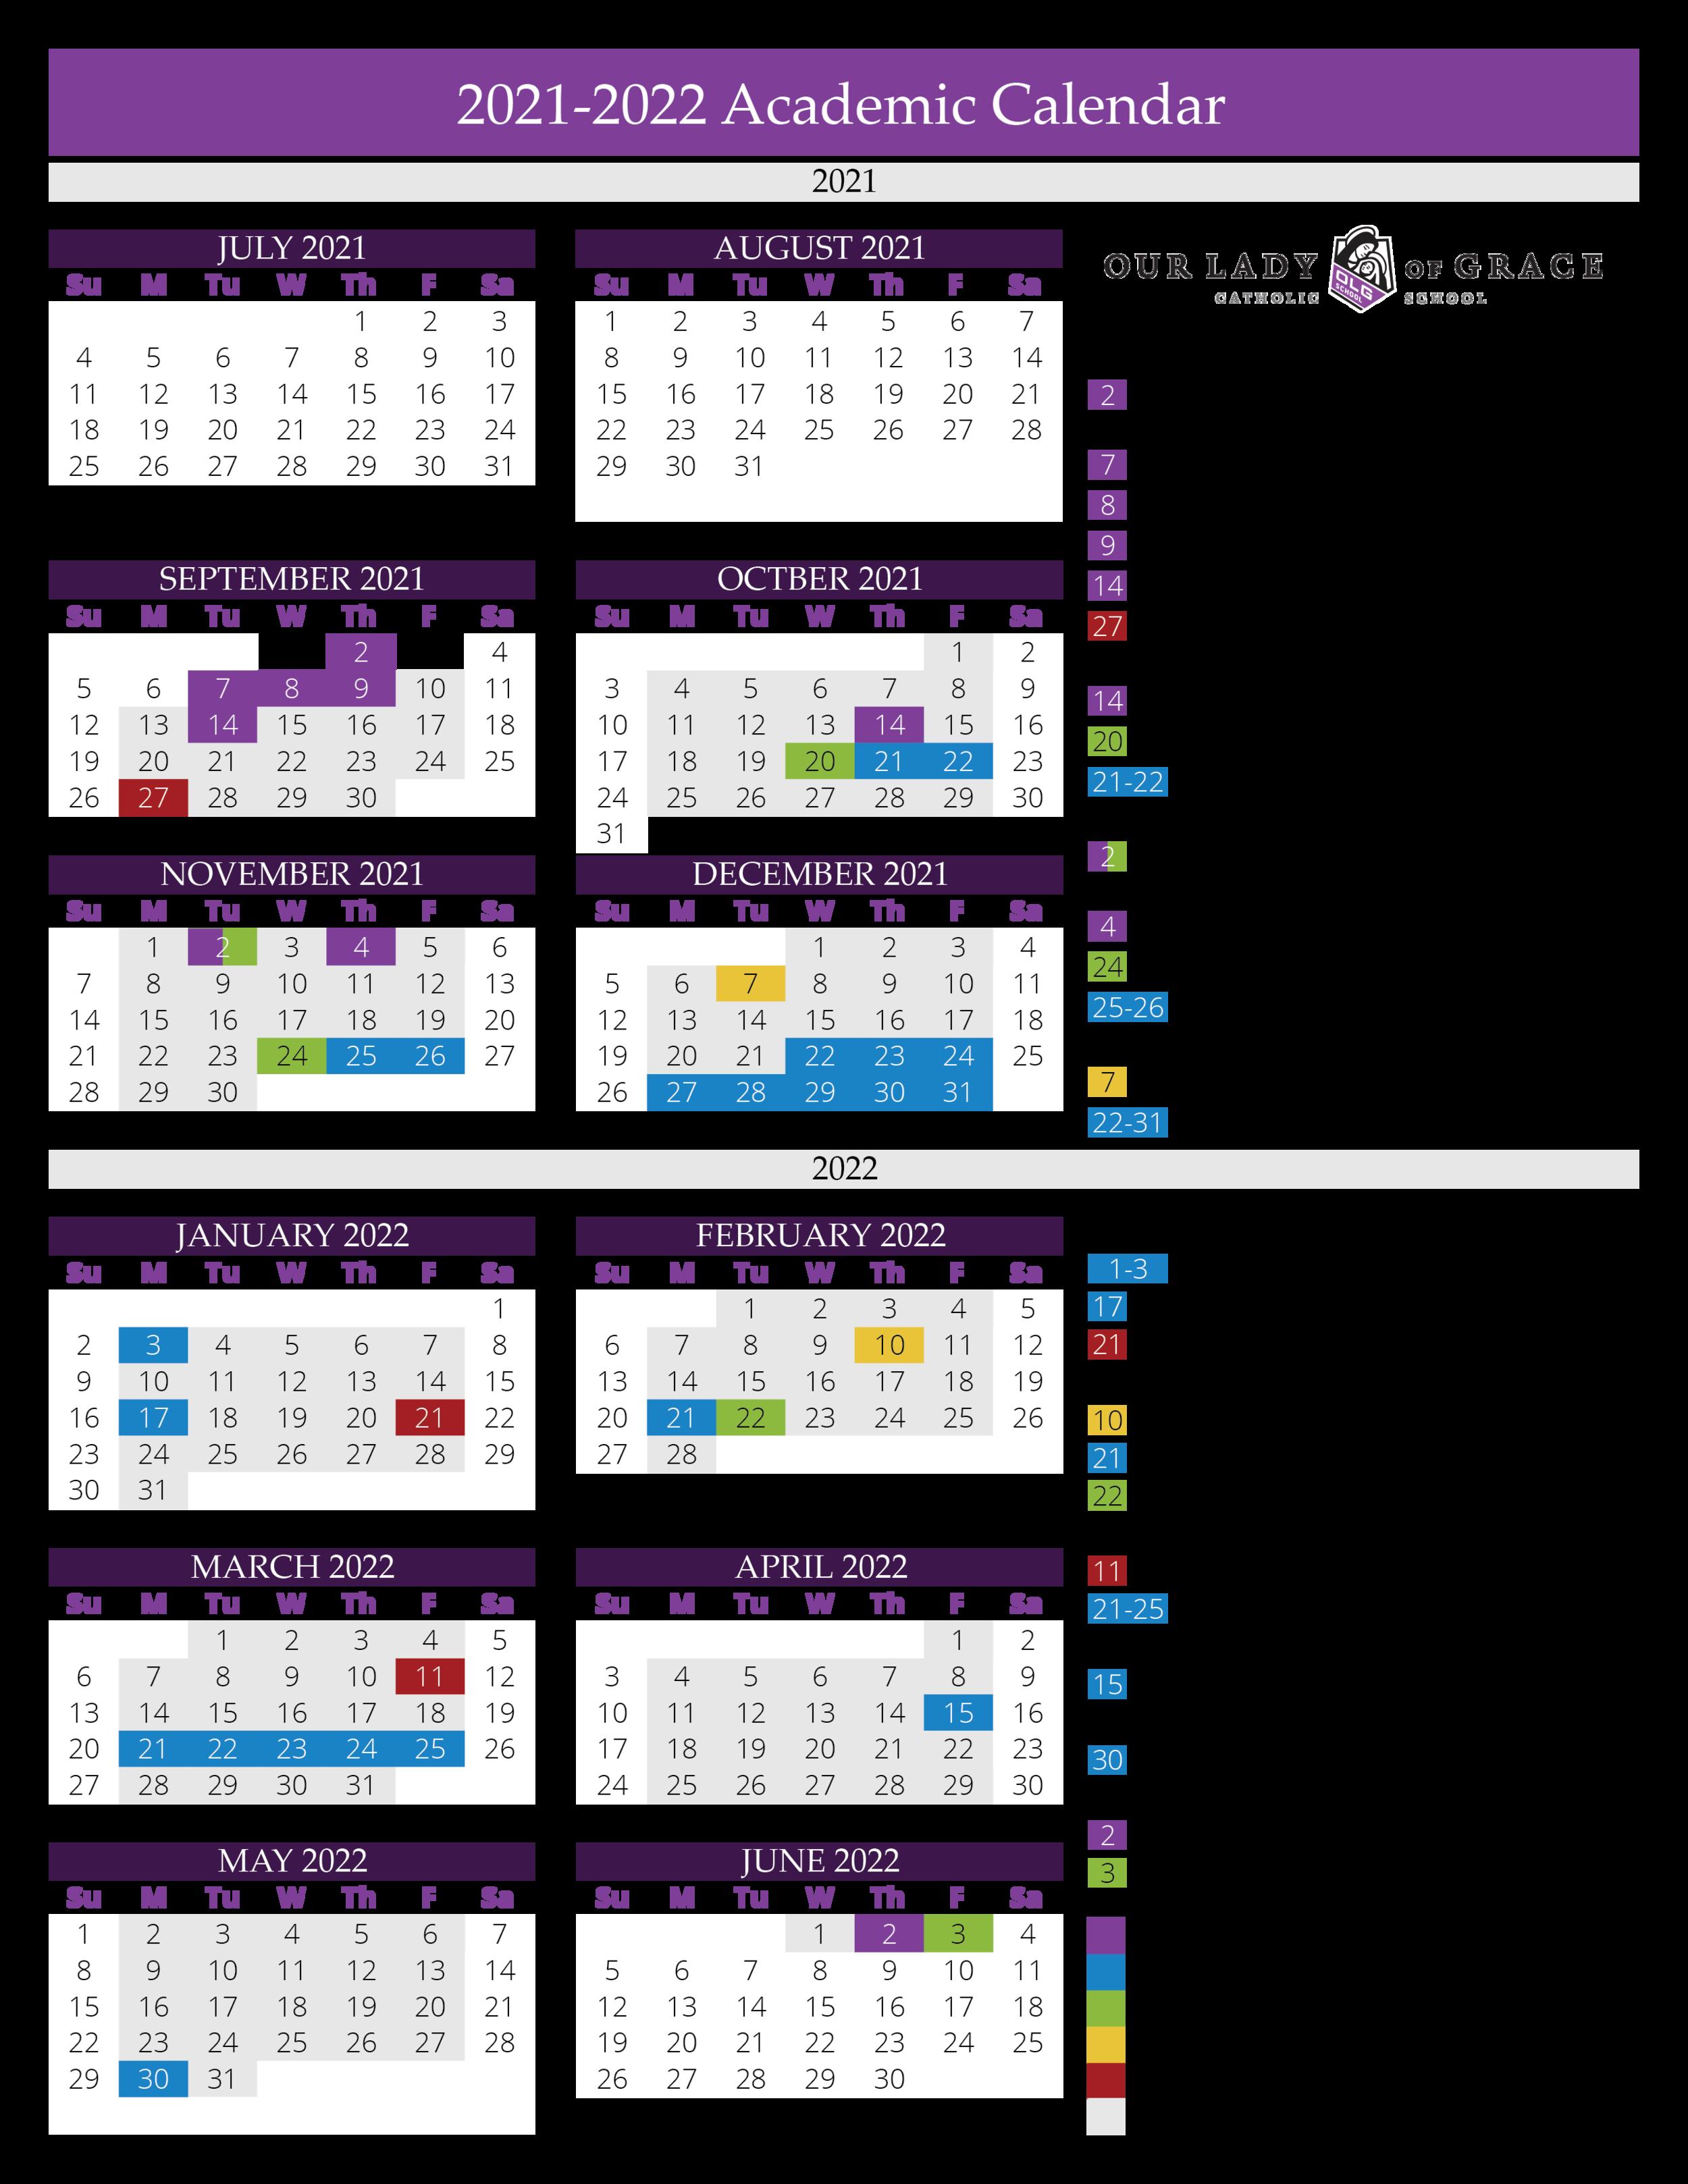 Catholic Church Calendar 2022.Calendar At A Glance 2021 2022 Our Lady Of Grace Catholic School